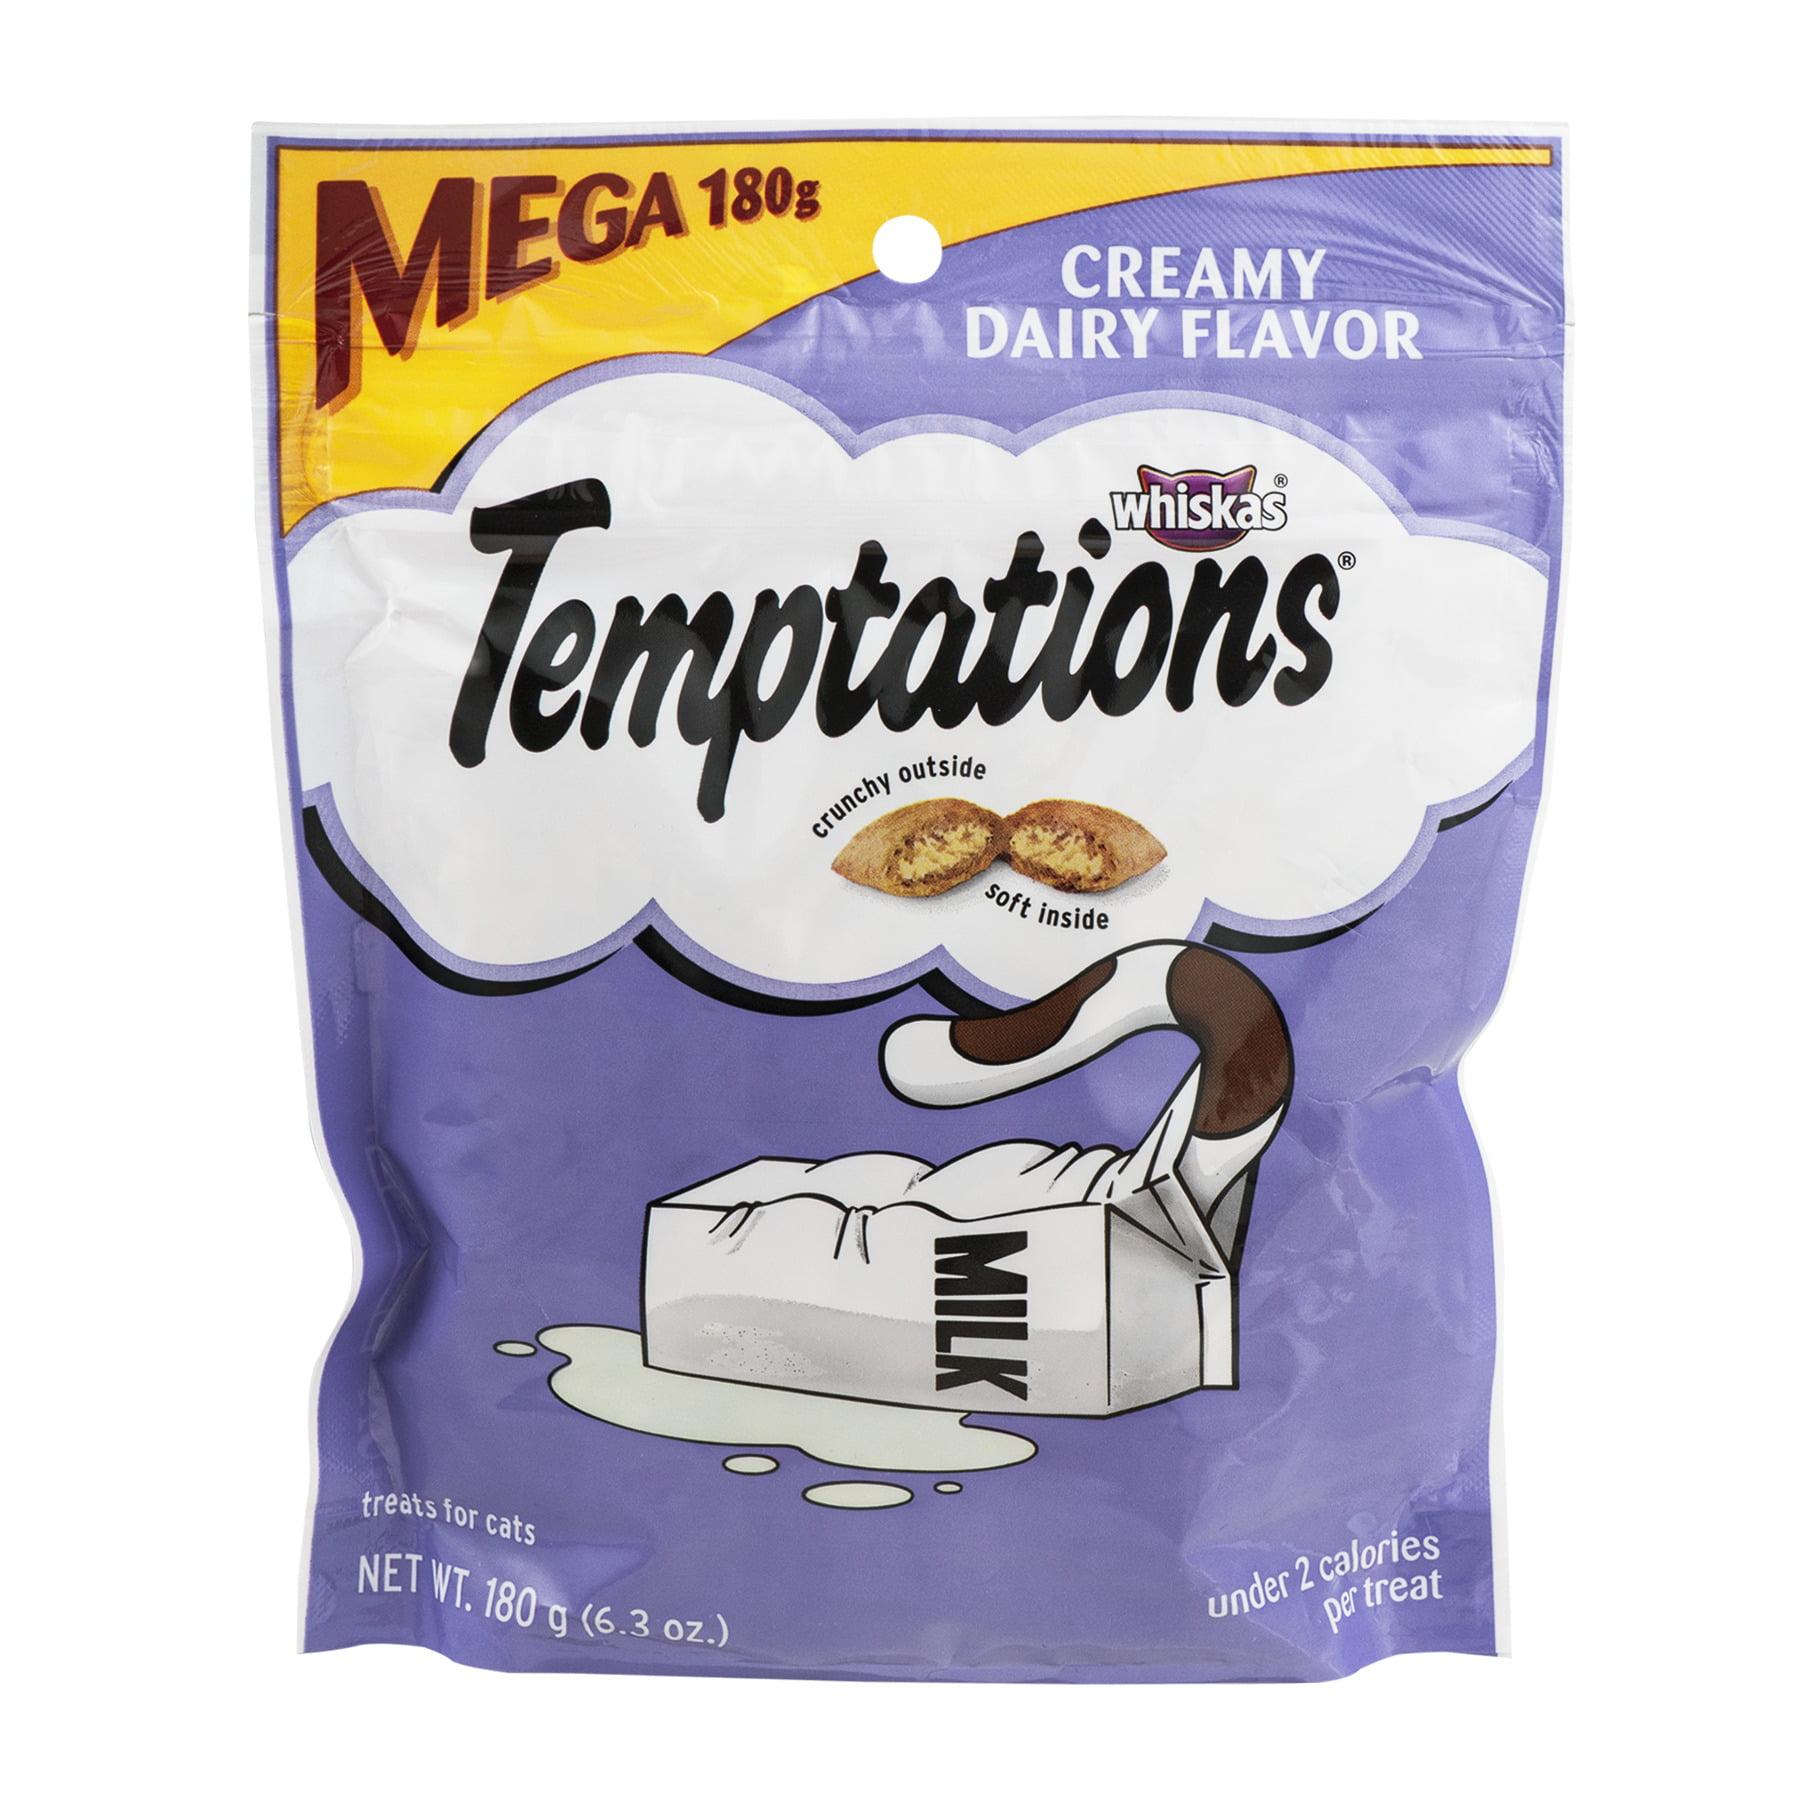 Temptations Classic Creamy Dairy Flavor Cat Treats, 6.3 Oz